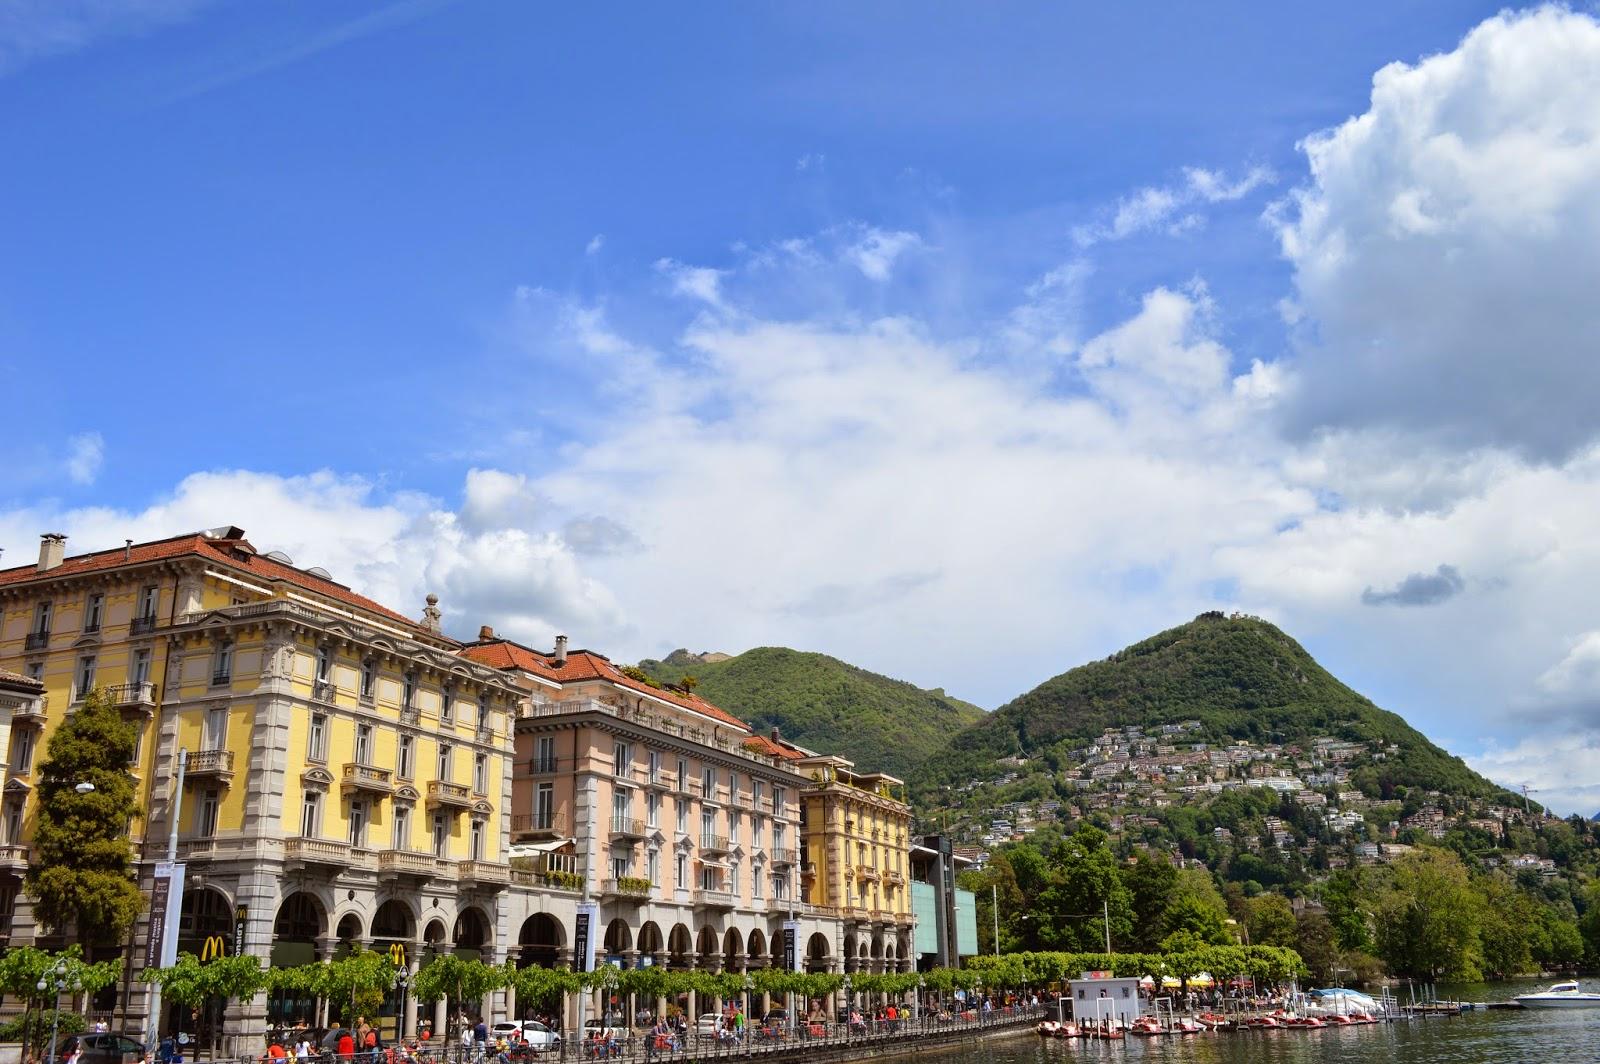 Lugano and Monte Bre, http://sleachmouradventures.blogspot.com